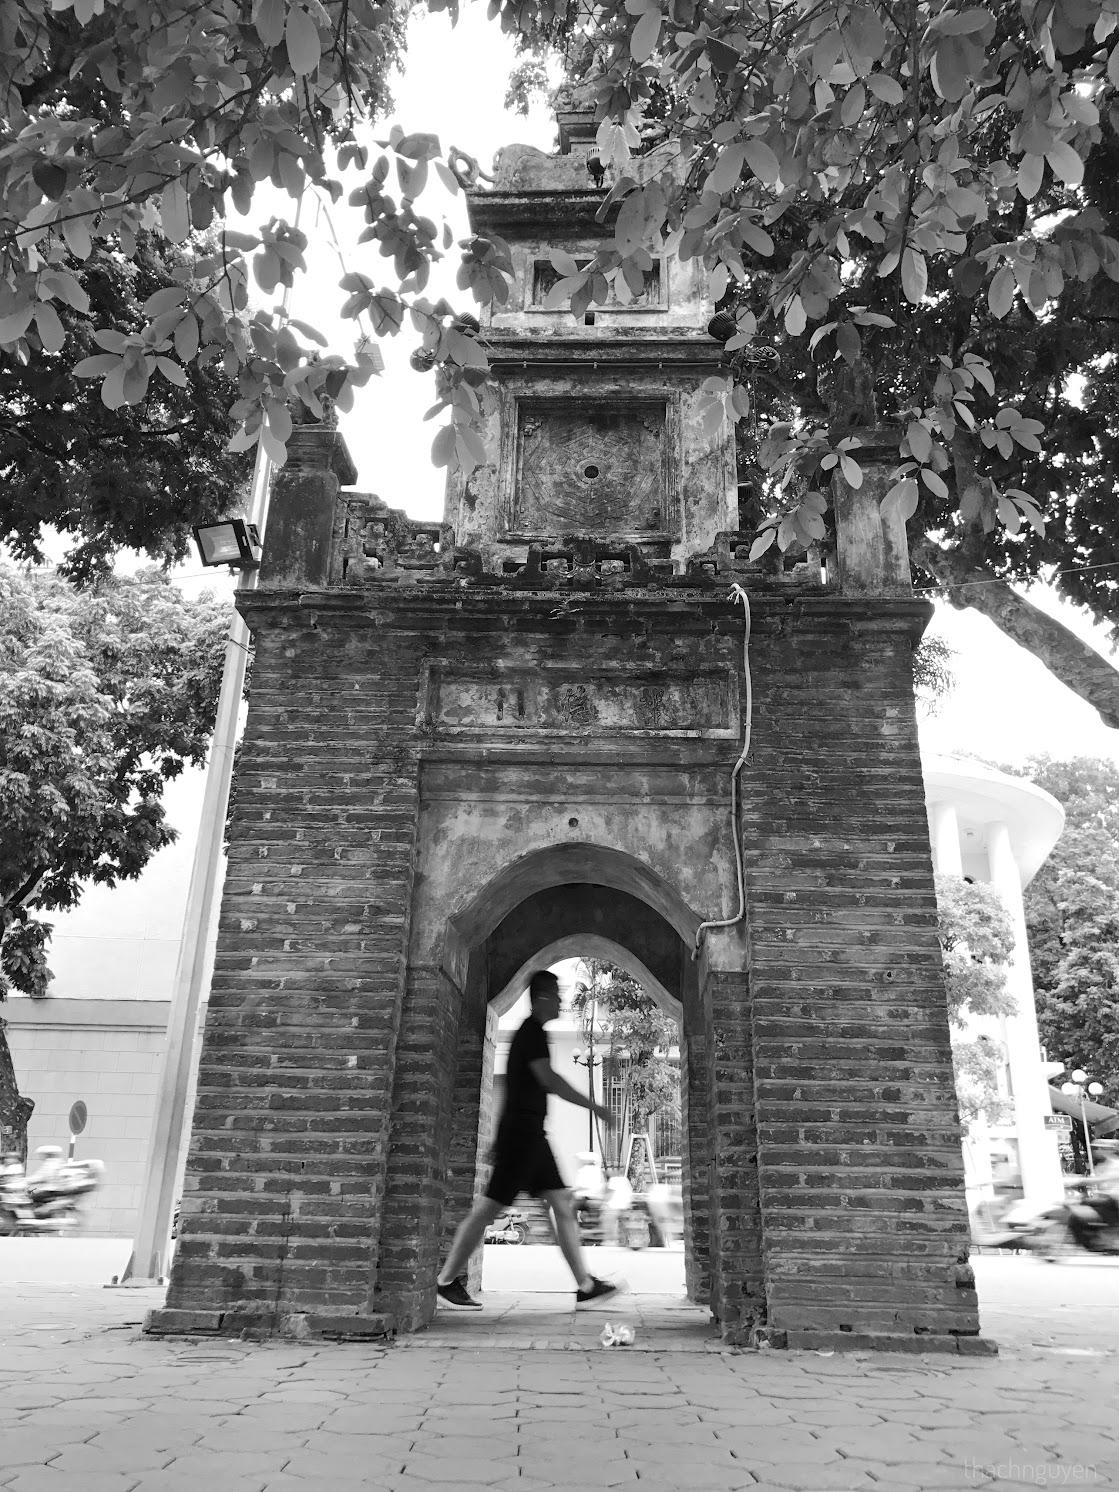 Tháp Hòa Phong